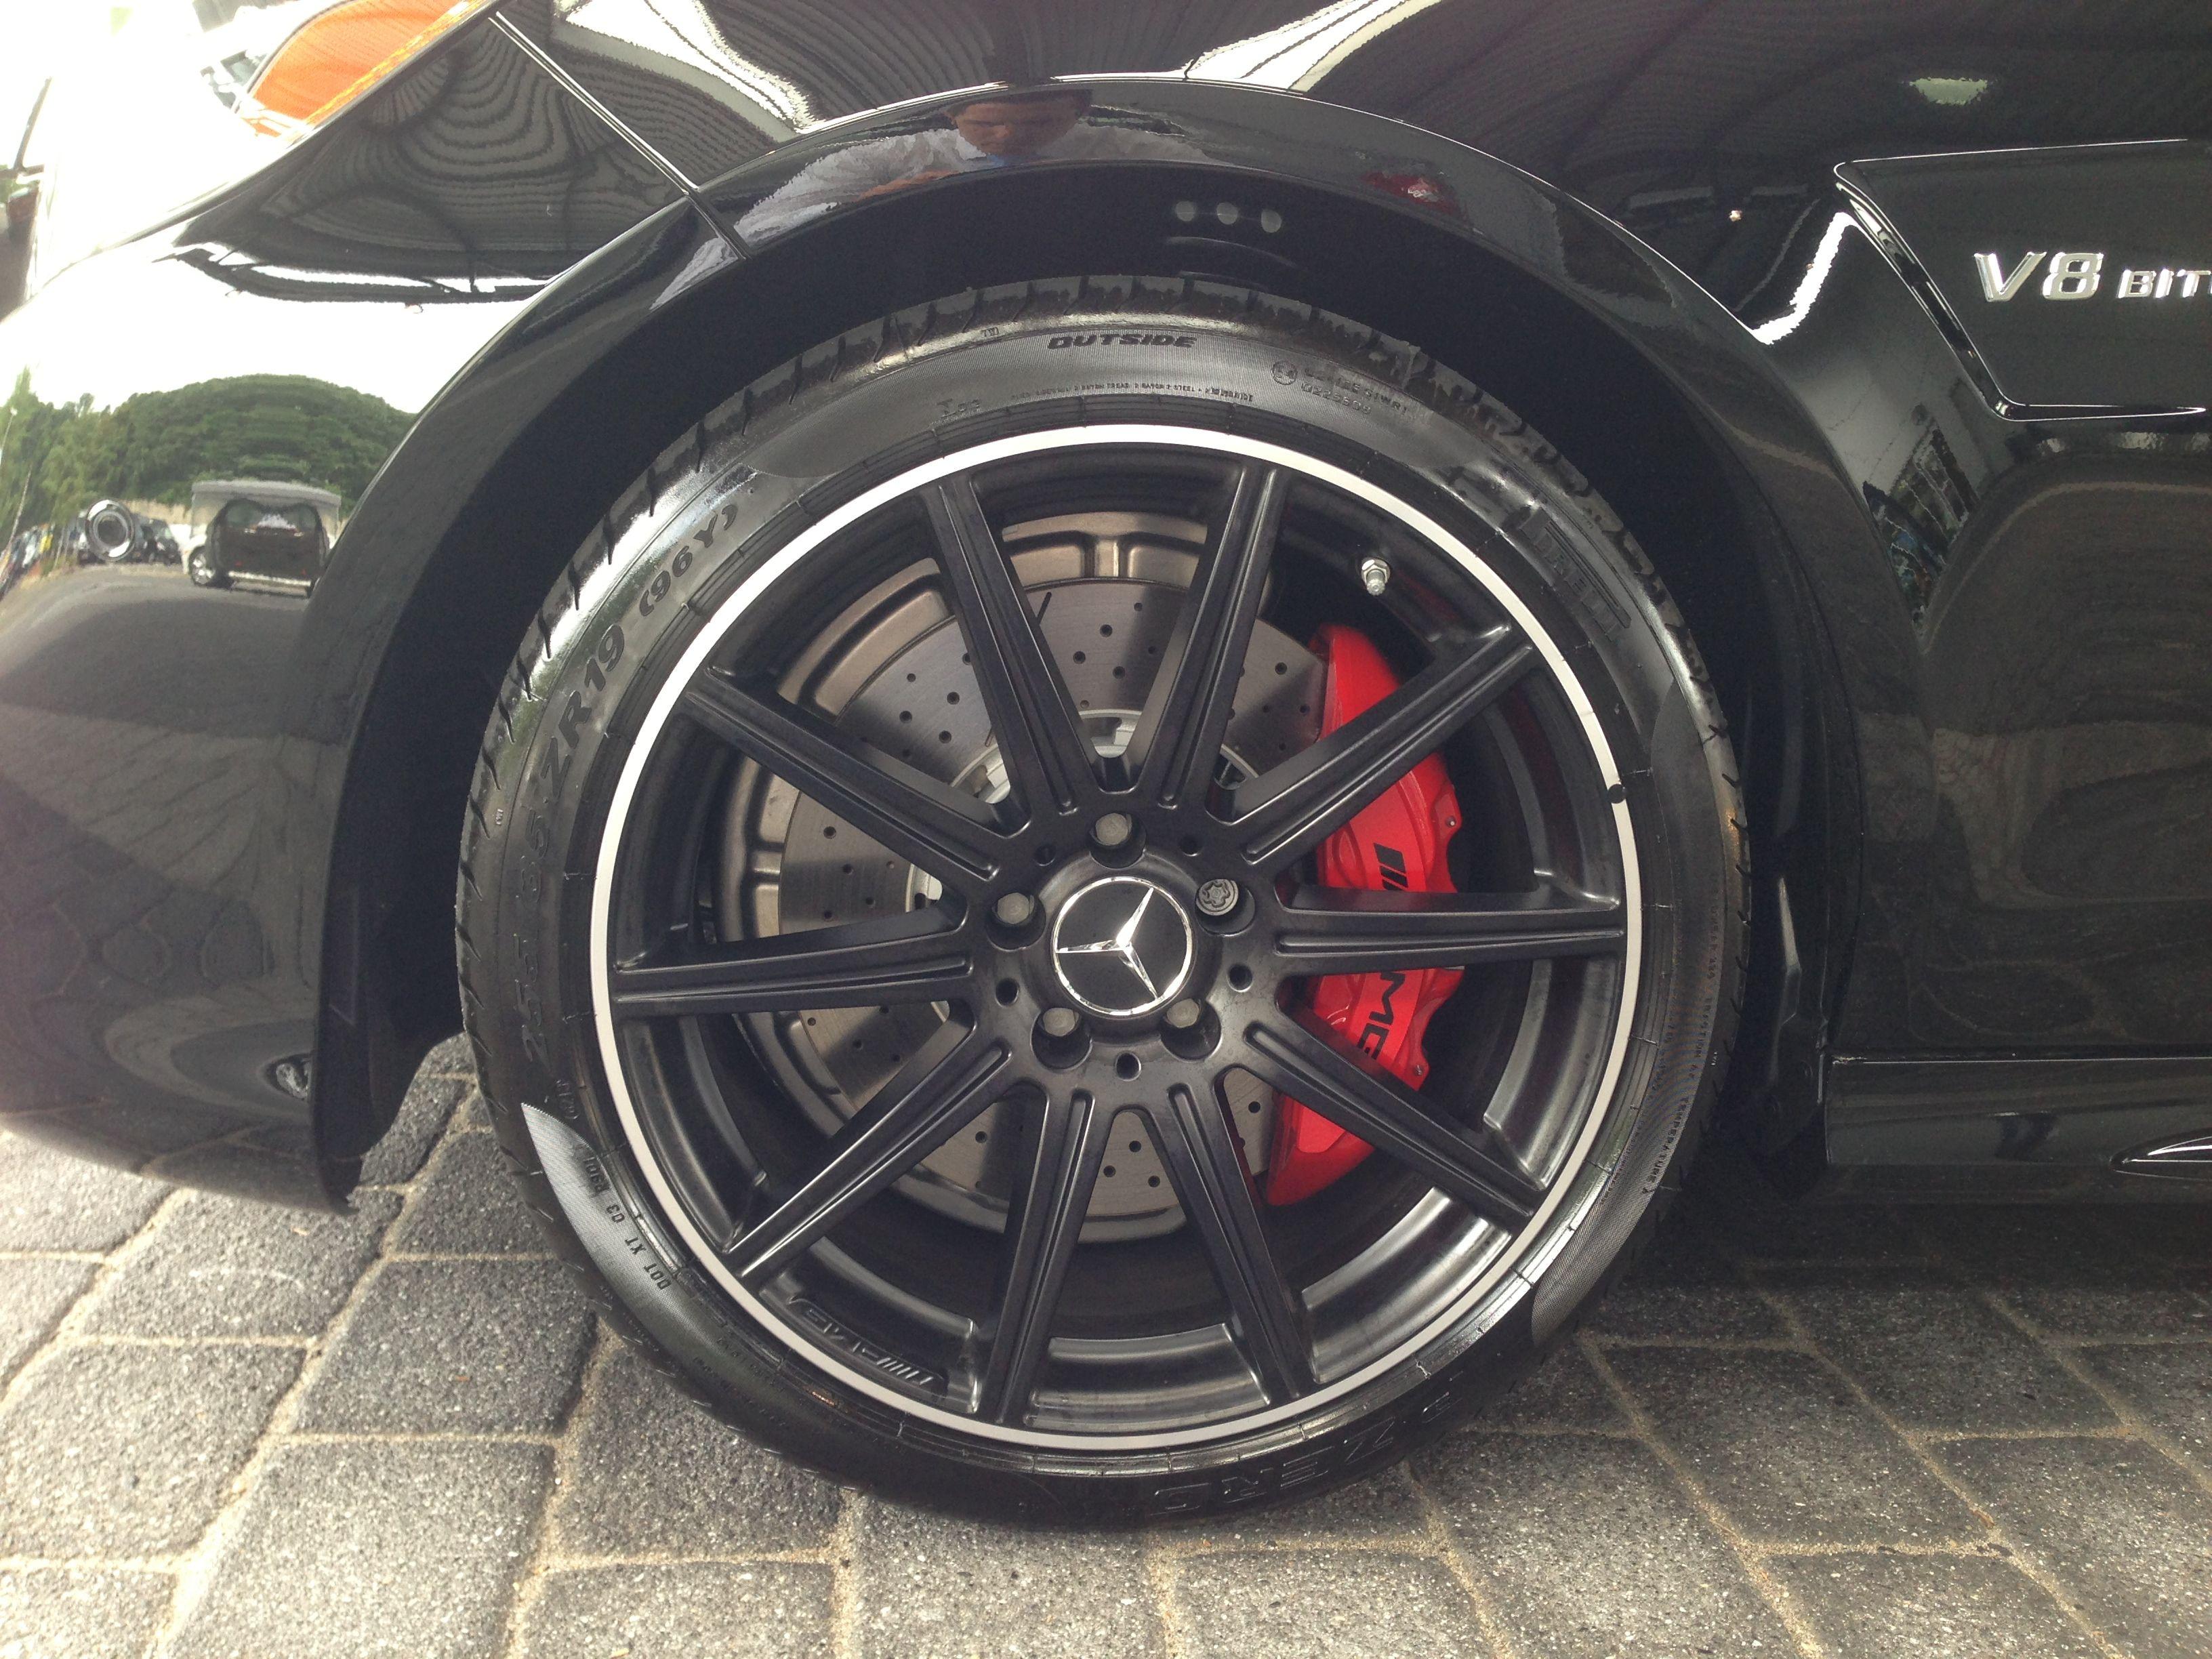 19 Ten Spoke Amg Wheels Mercedes Benz Wheel Car Wheel